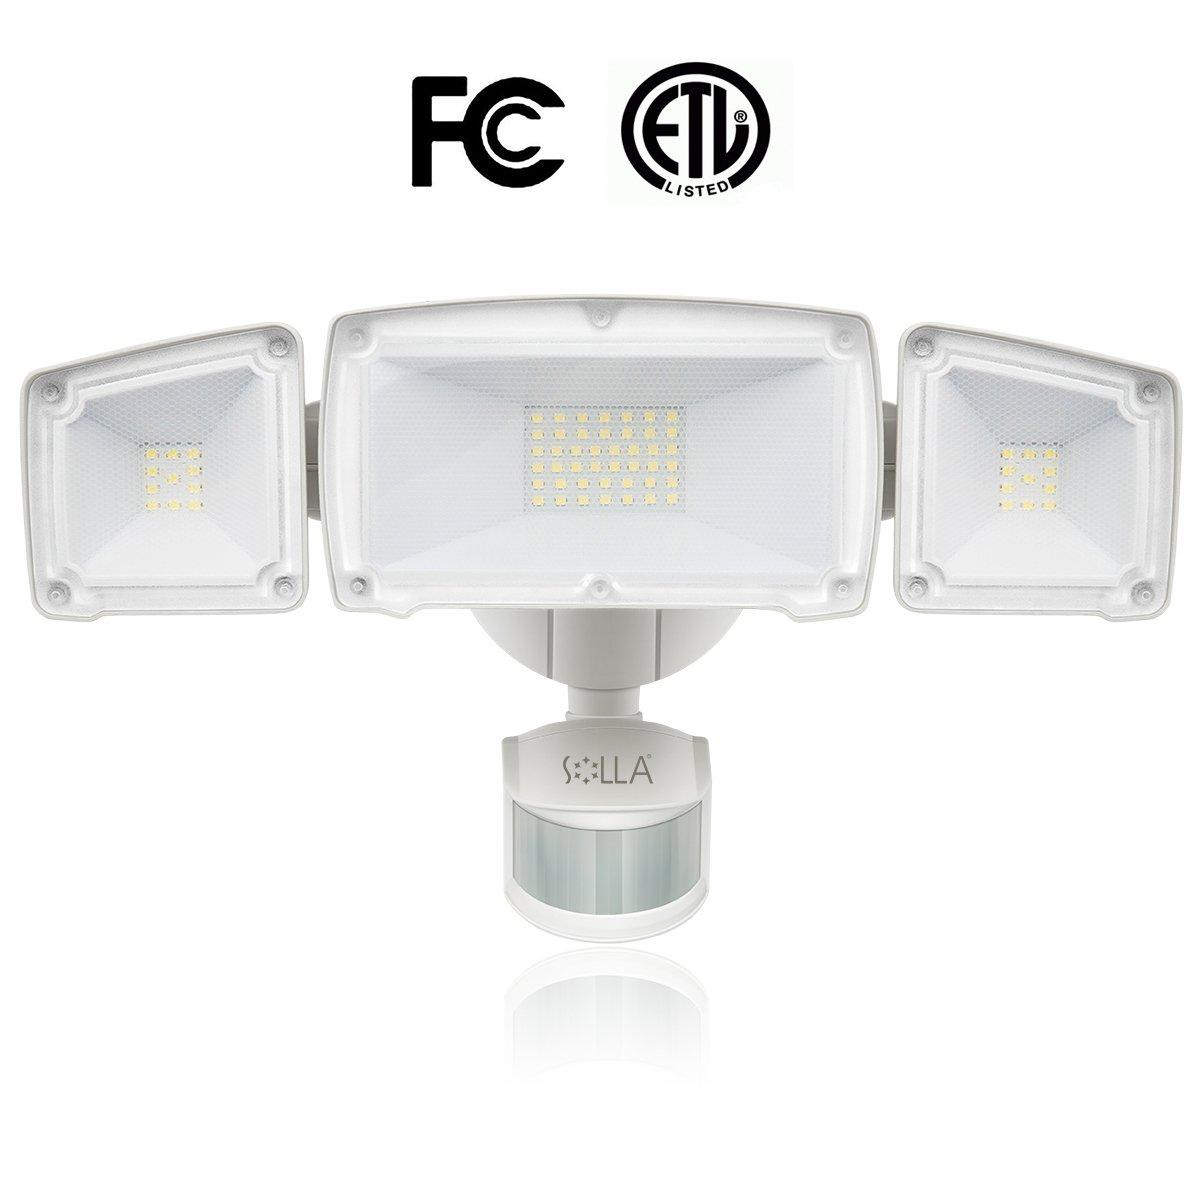 SOLLA LED Security Light, 39W (200W Equivalent) Outdoor Motion Sensor Light, 3000lm, 6000K Daylight White, Waterproof IP65 & ETL, 3 Adjustable Head, 120v